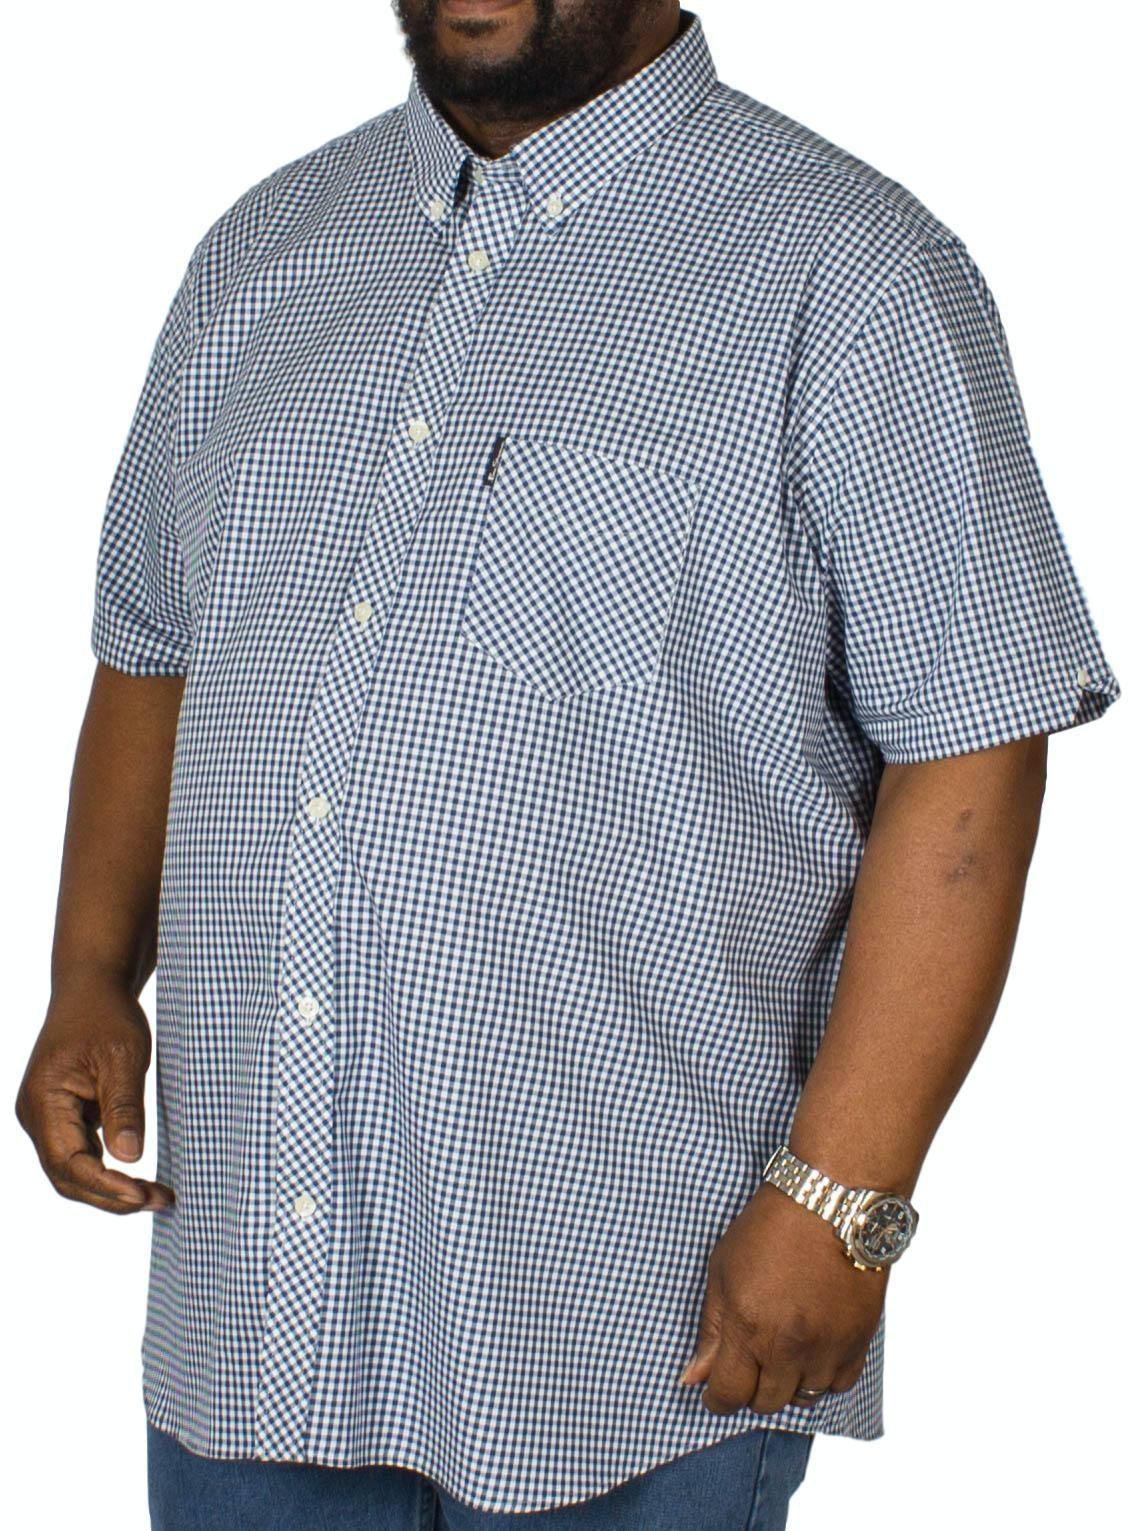 Ben Sherman Core Gingham Shirt Blue Denim